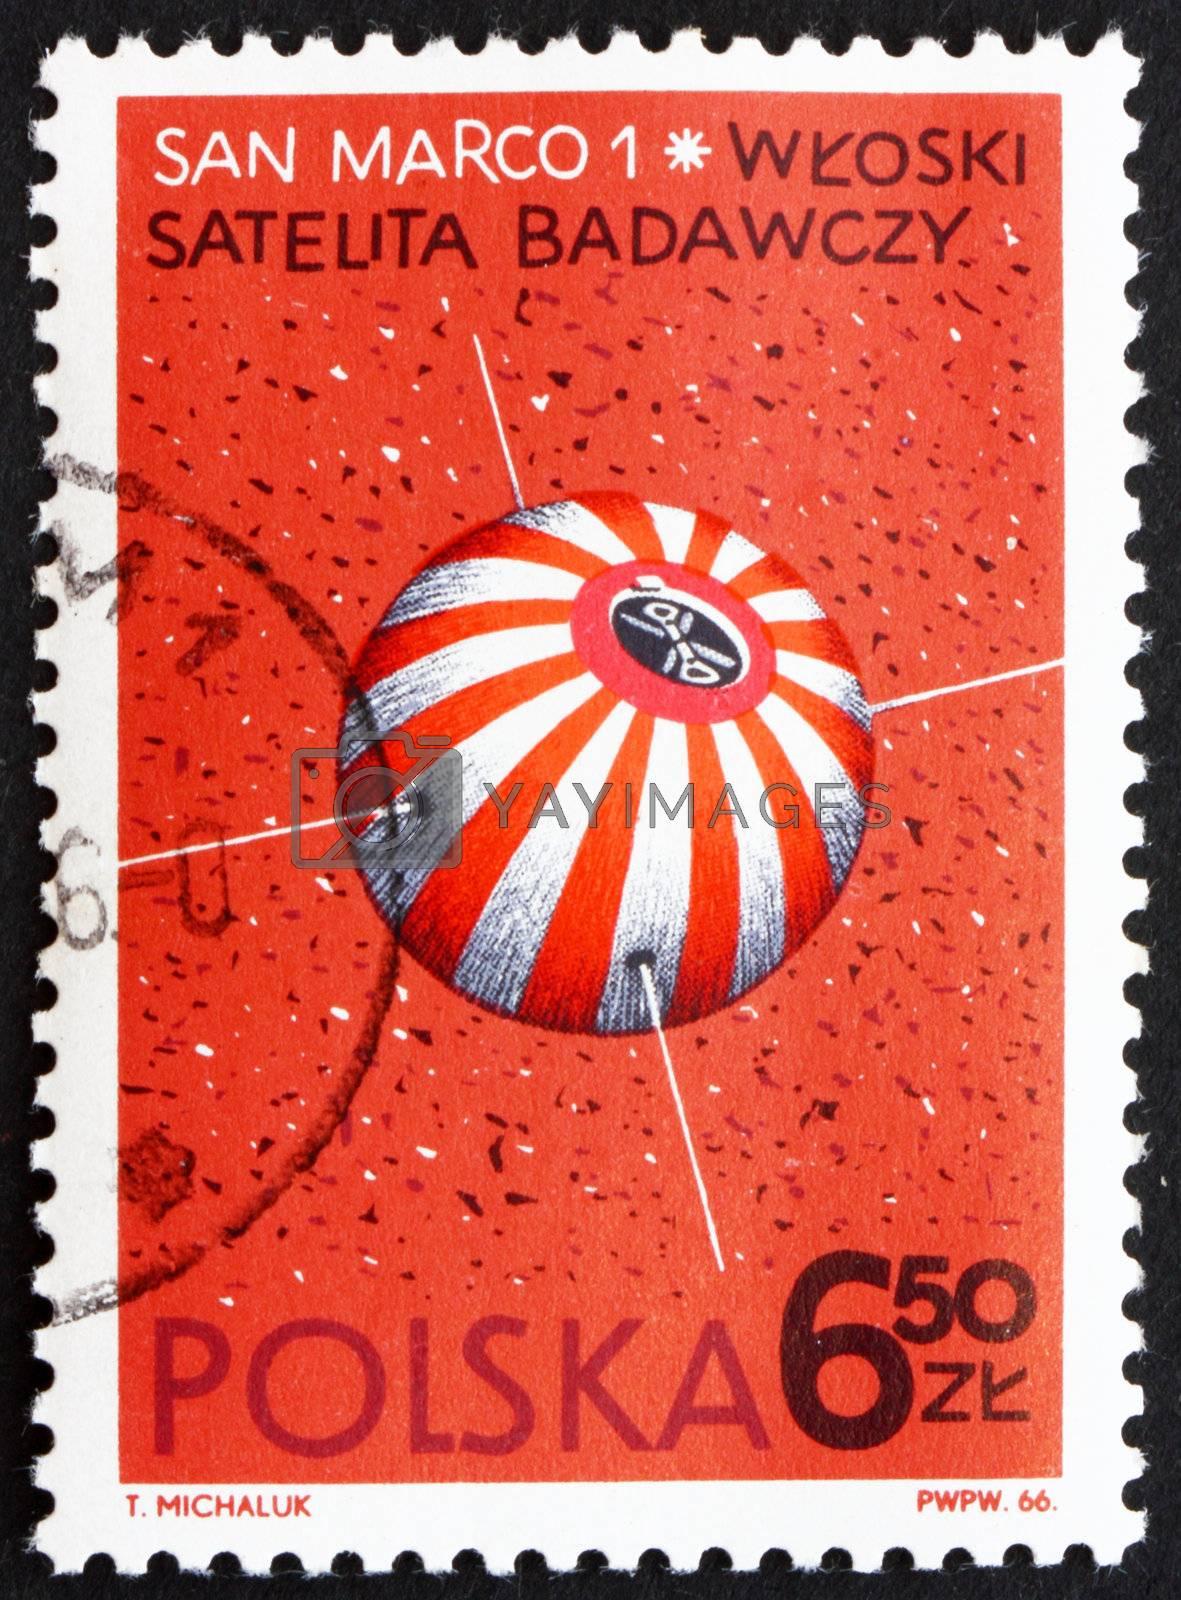 POLAND - CIRCA 1966: a stamp printed in the Poland shows San Marco 1, Italian Satellite, circa 1966